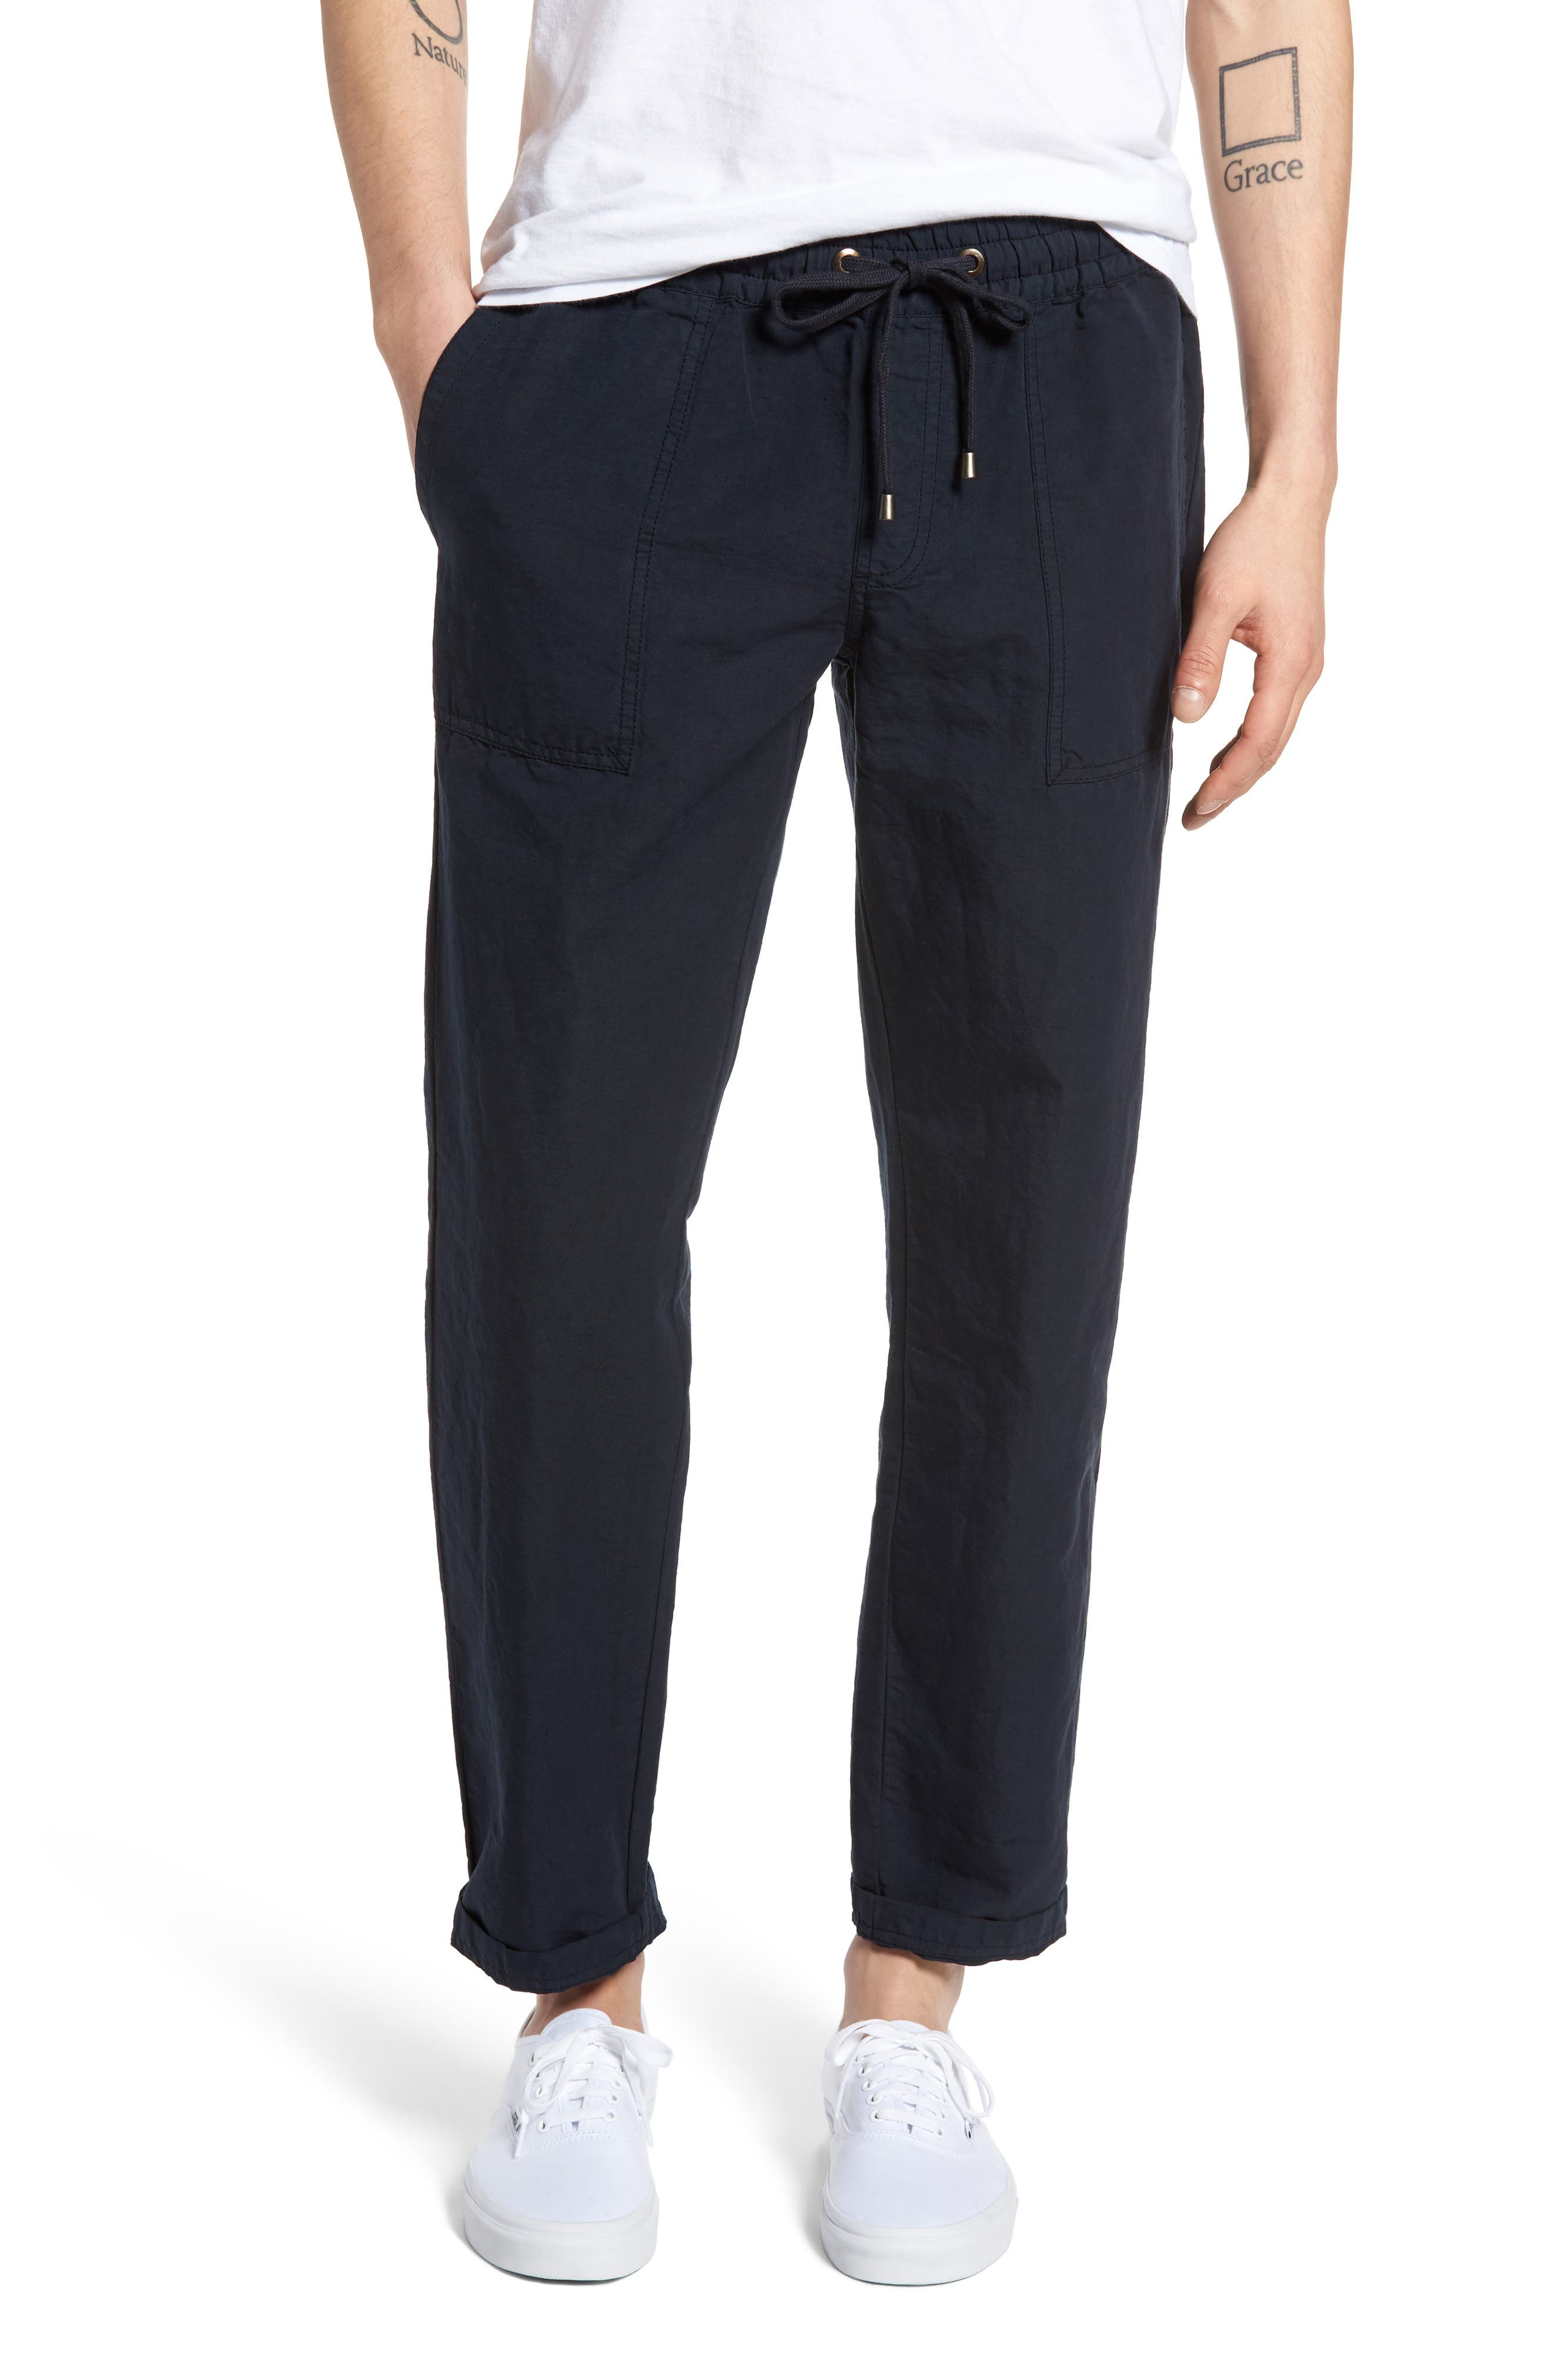 TREASURE & BOND Loose Drawstring Pants